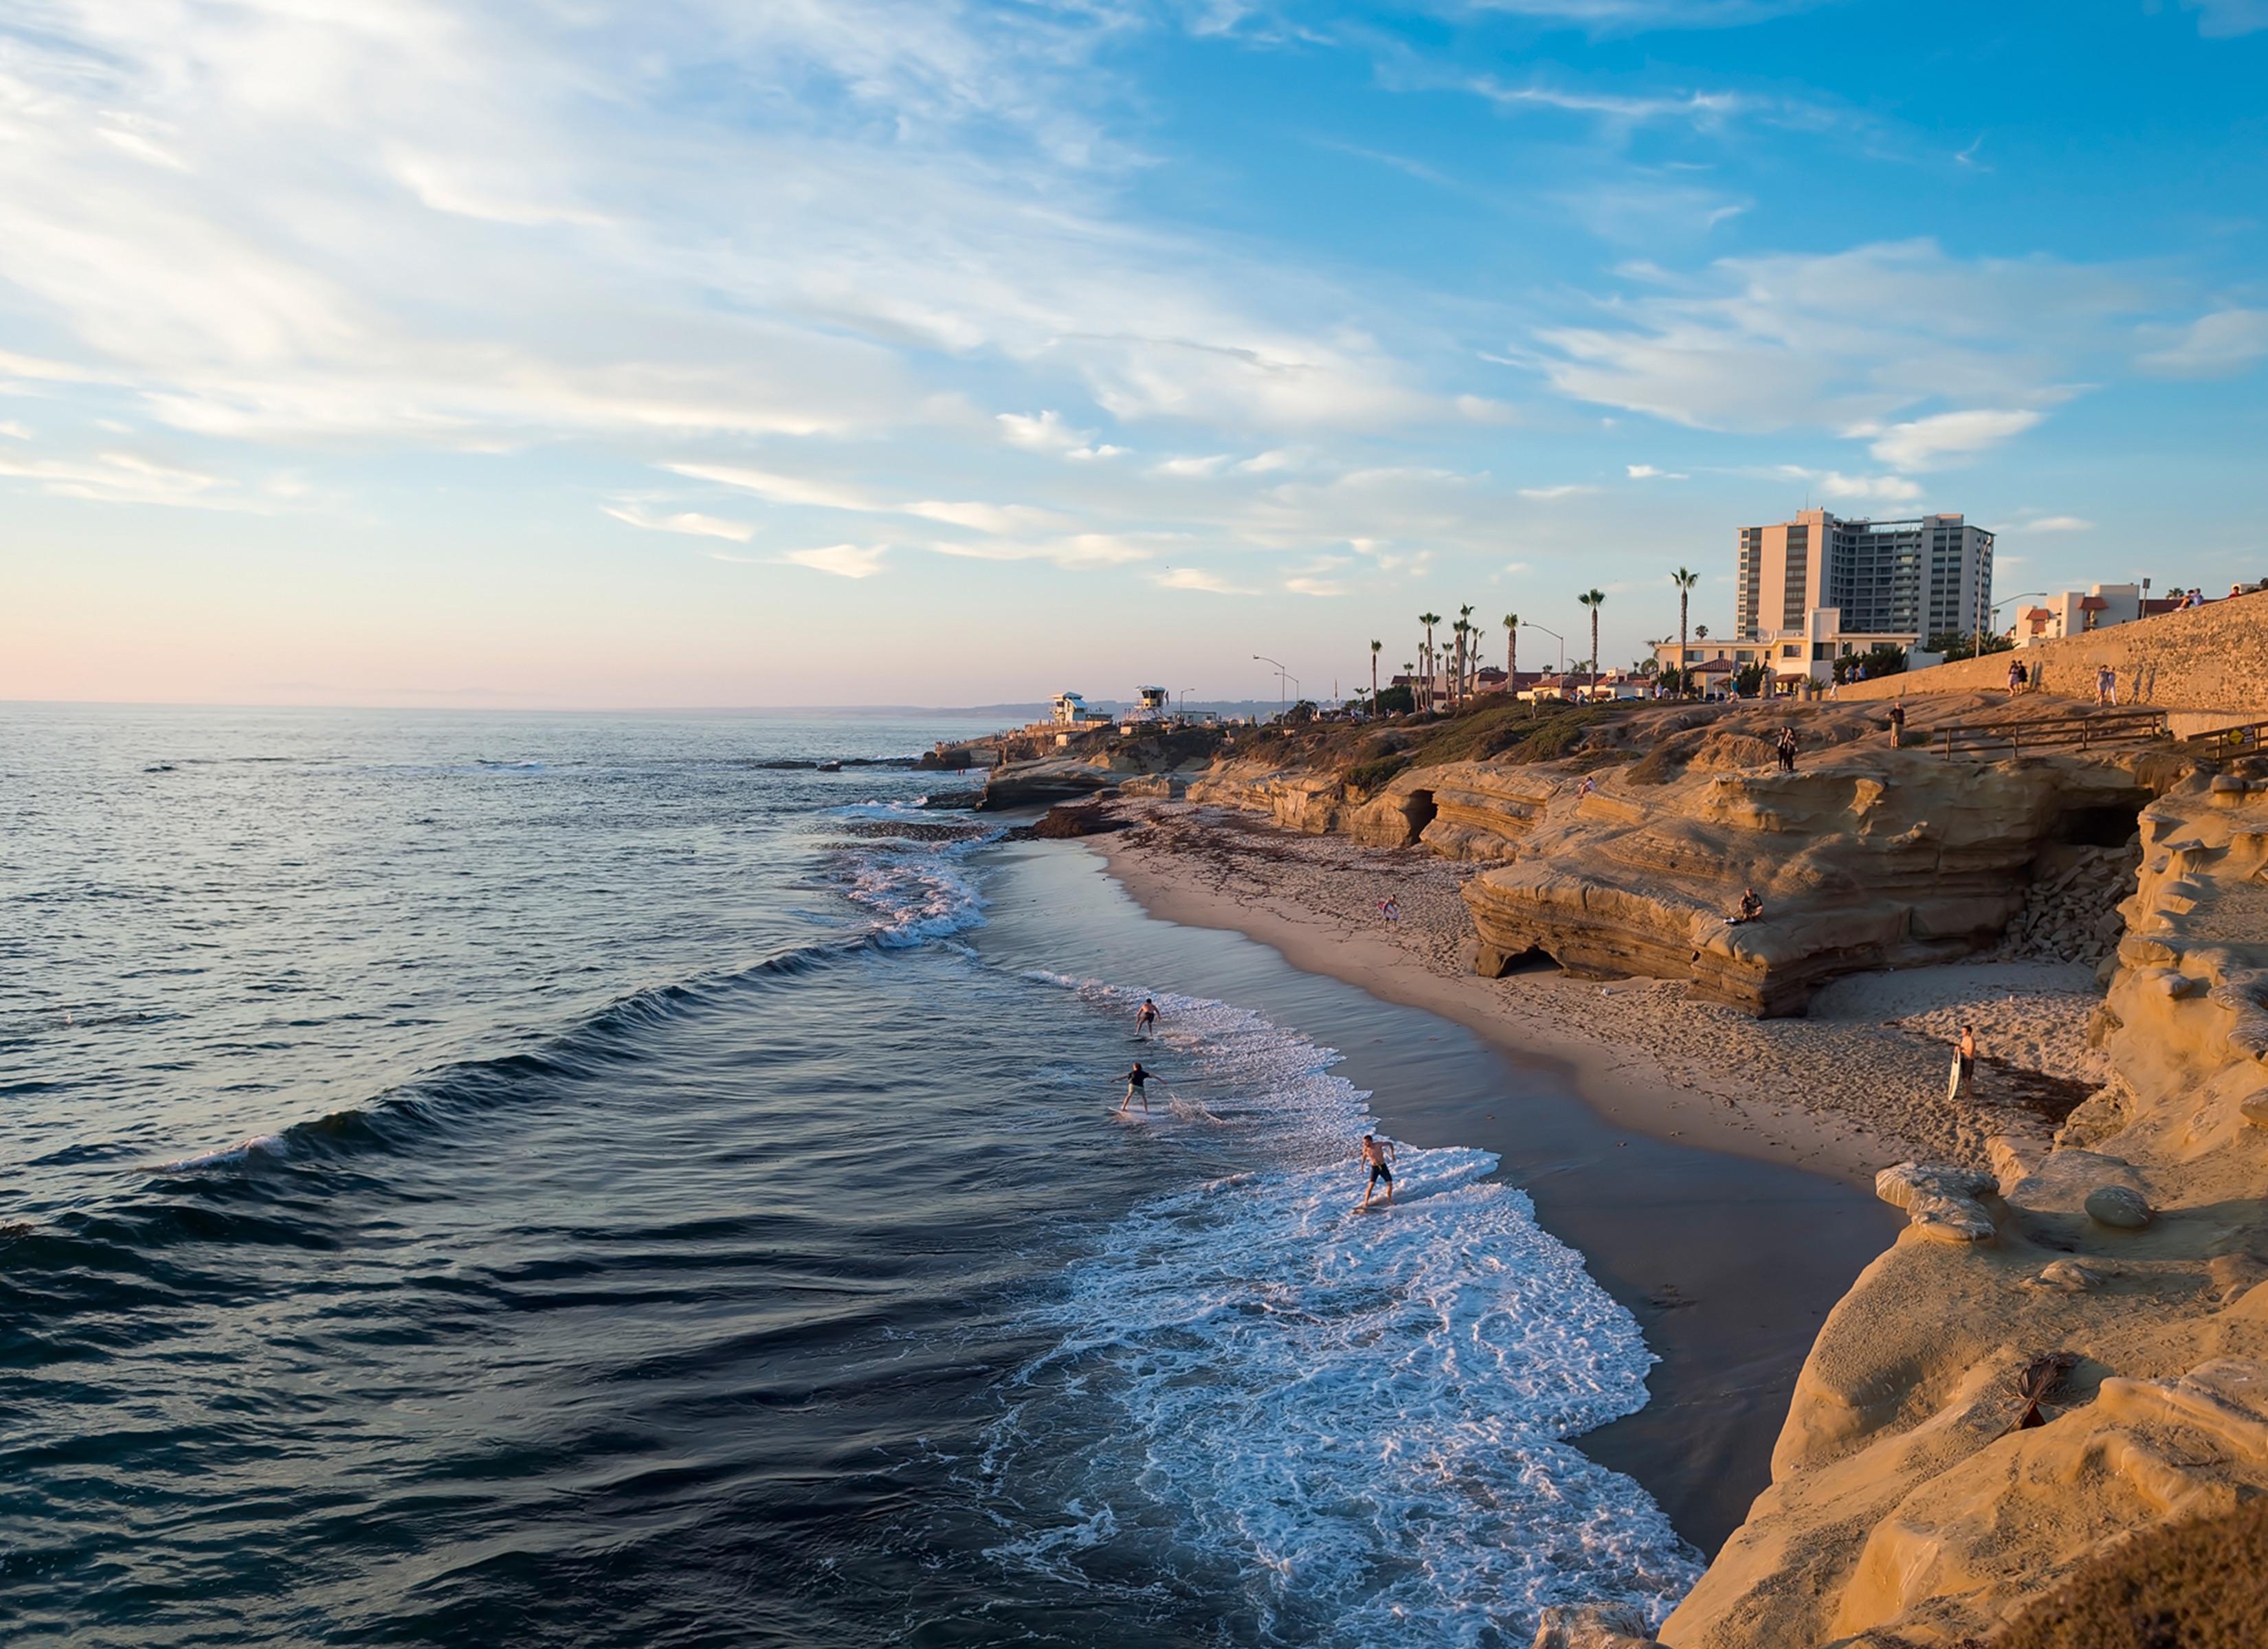 Природа и пляжи на крите фото тебе